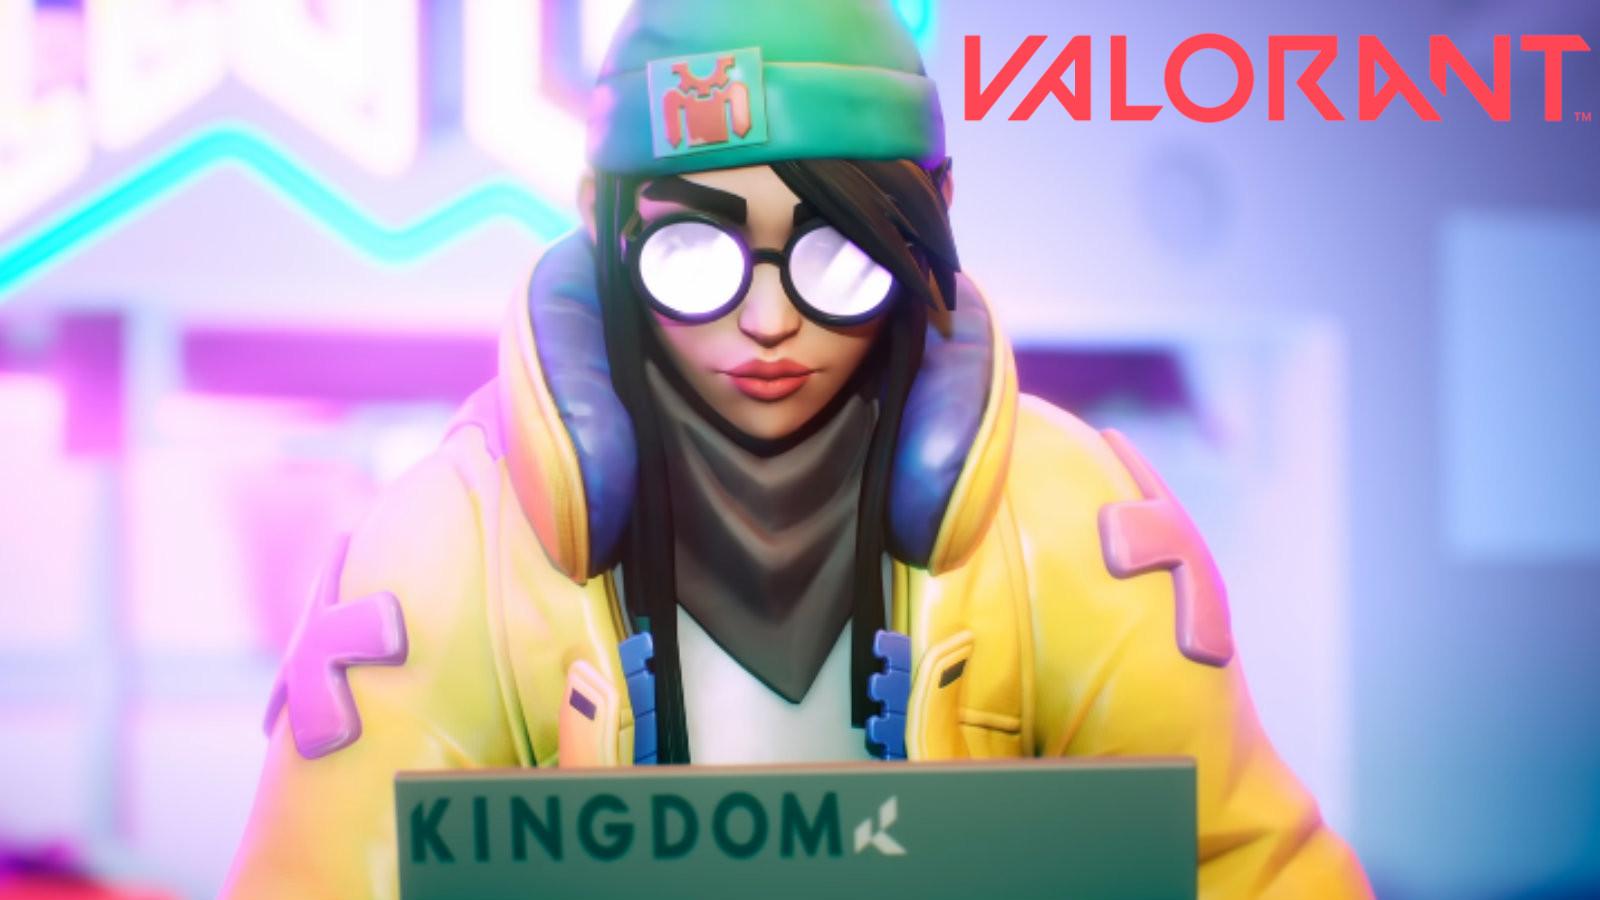 Valorant's Killjoy sits at her computer